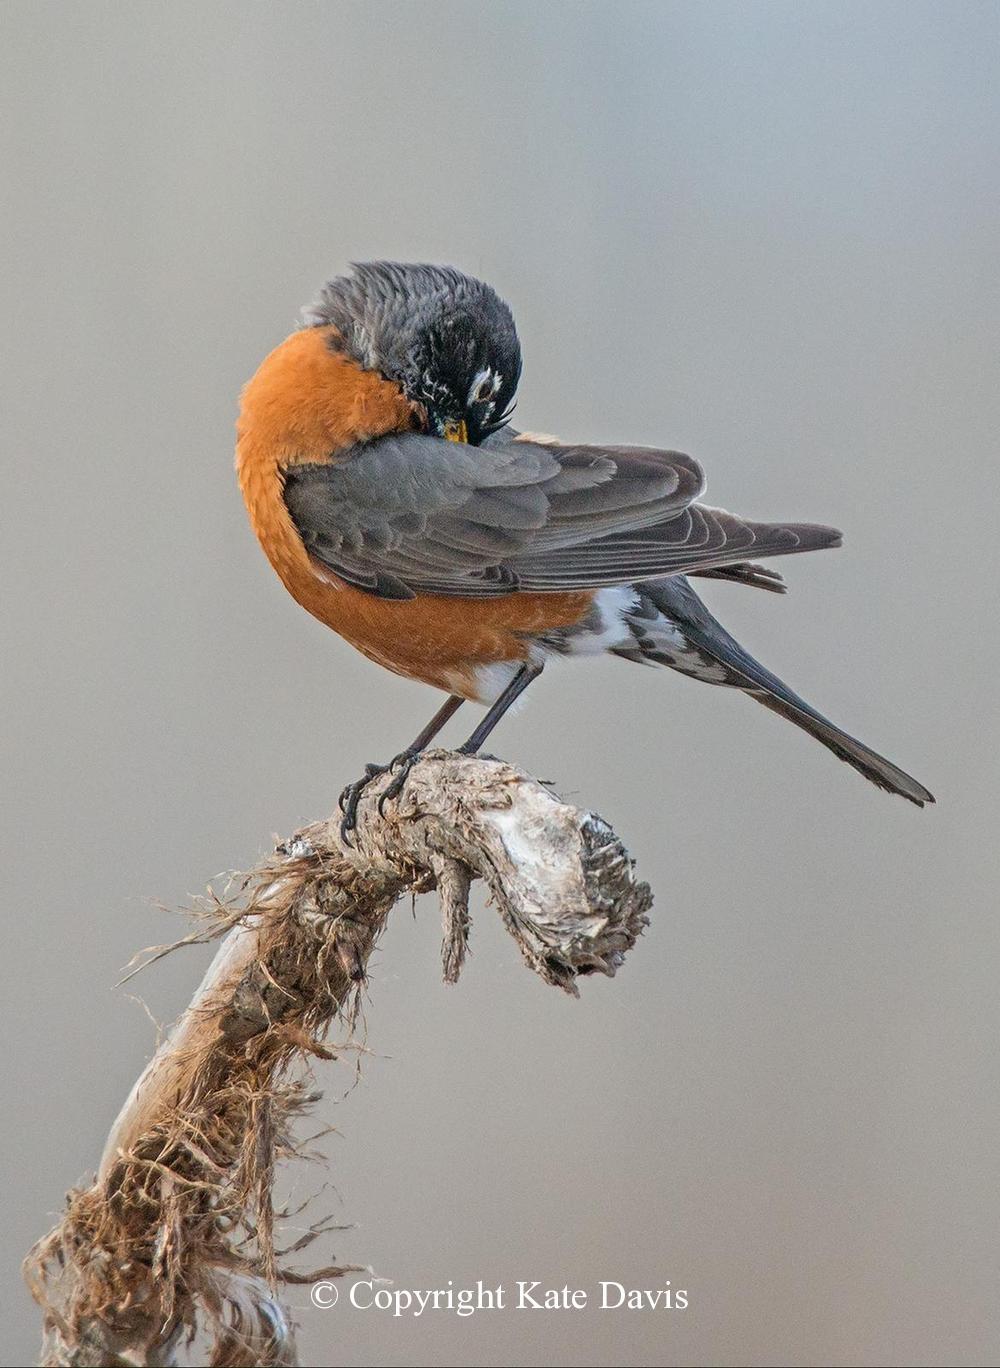 Song Bird Photos - Preening Robin - Shore Bird Photos - Preening Robin, a whole serious of four framed and in the living room